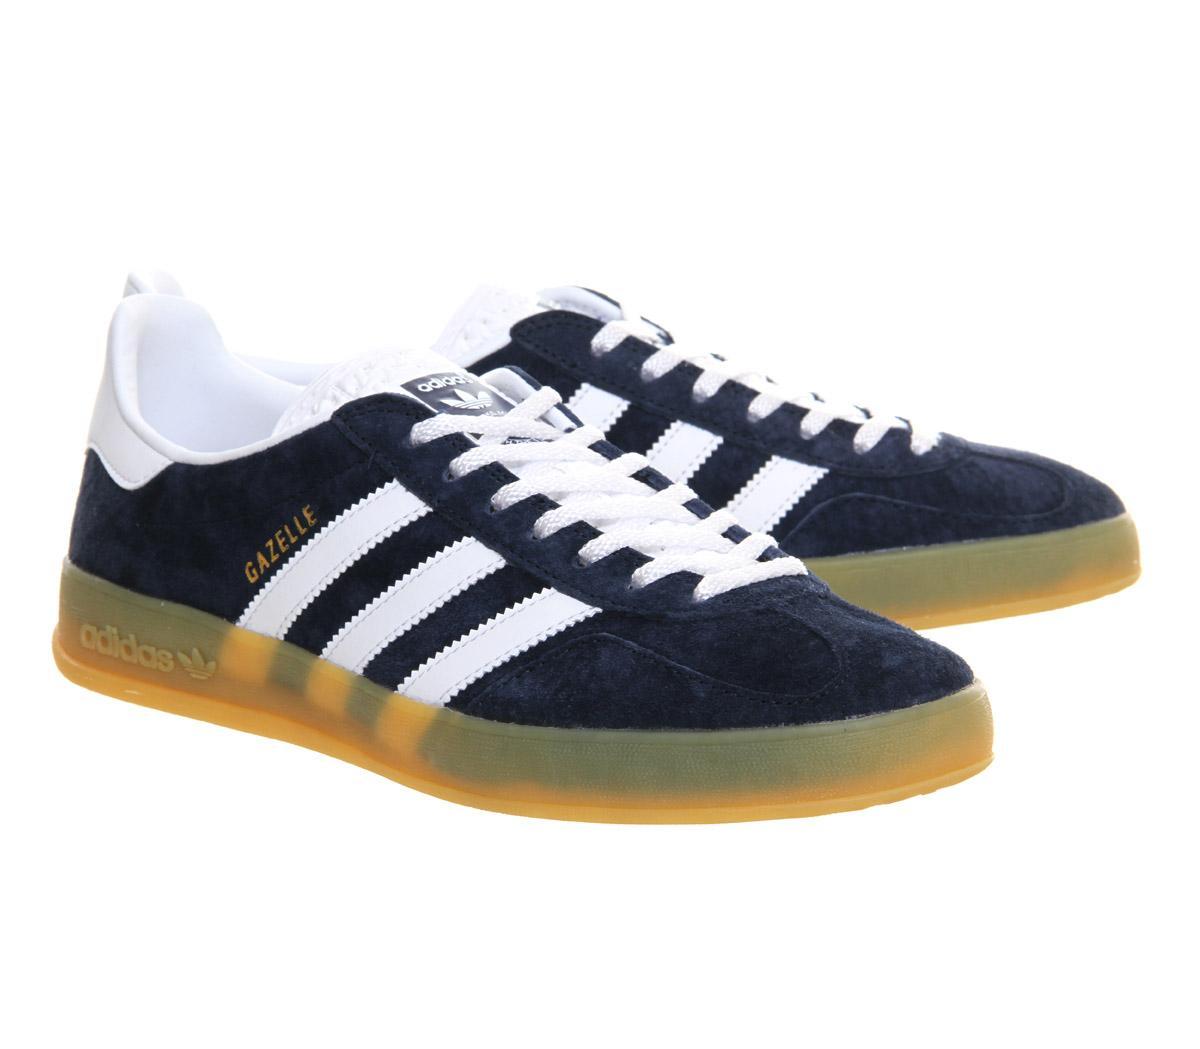 Gallery. Men's Adidas Gazelle